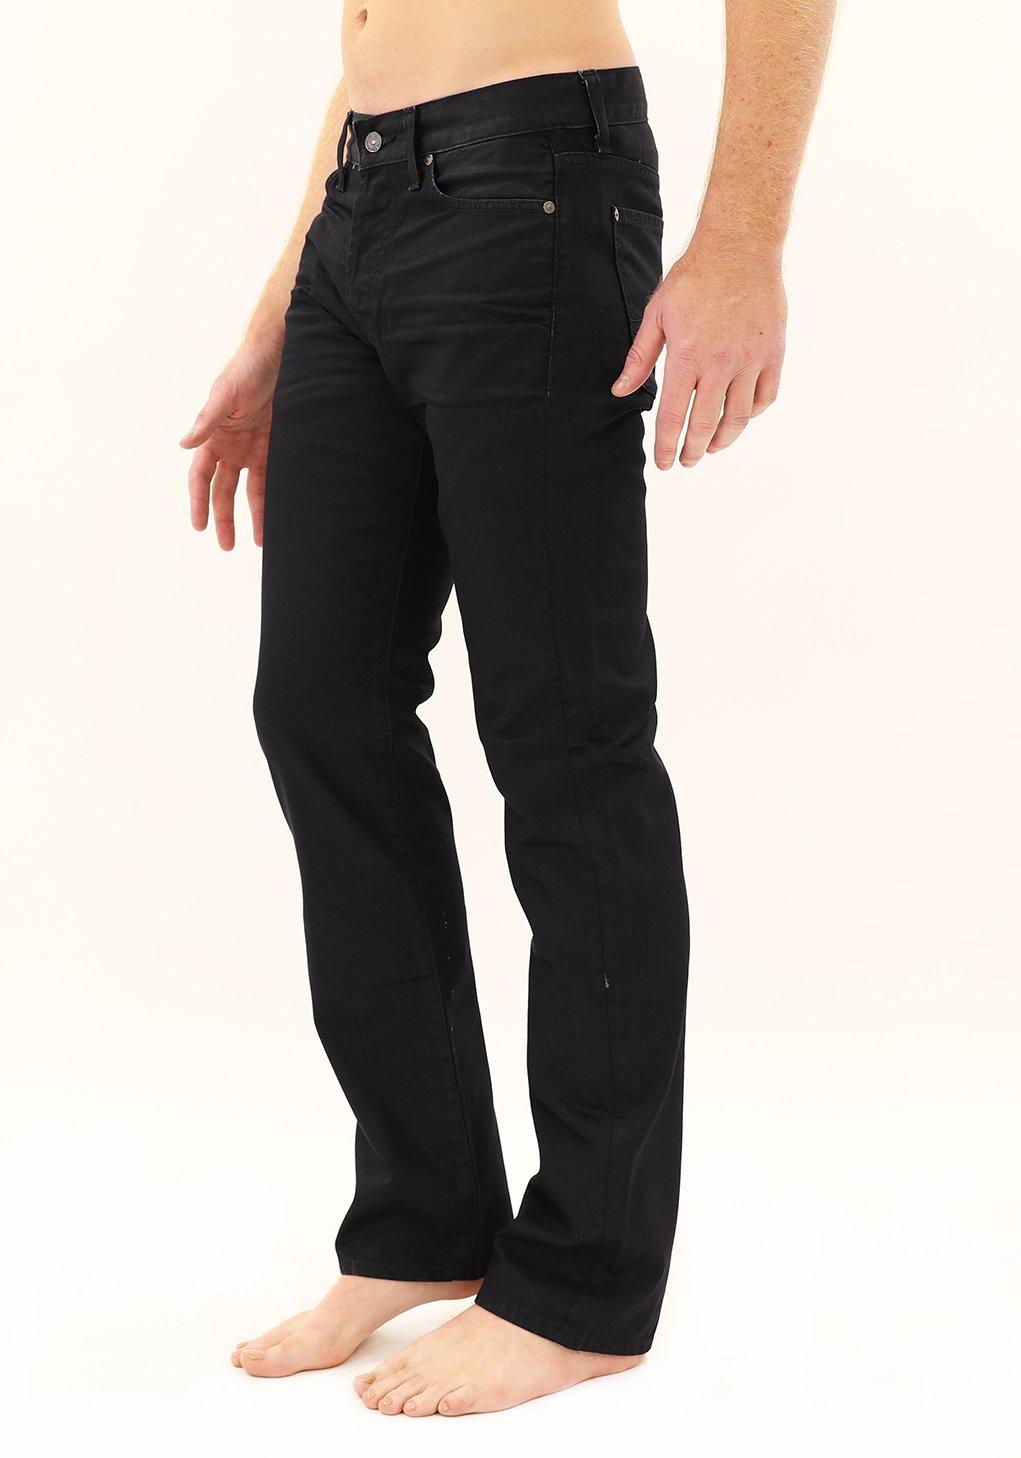 7 For All Mankind Men's Standard Classic Straight Leg Jean in Nighttime Sky, Nighttime Sky, 34